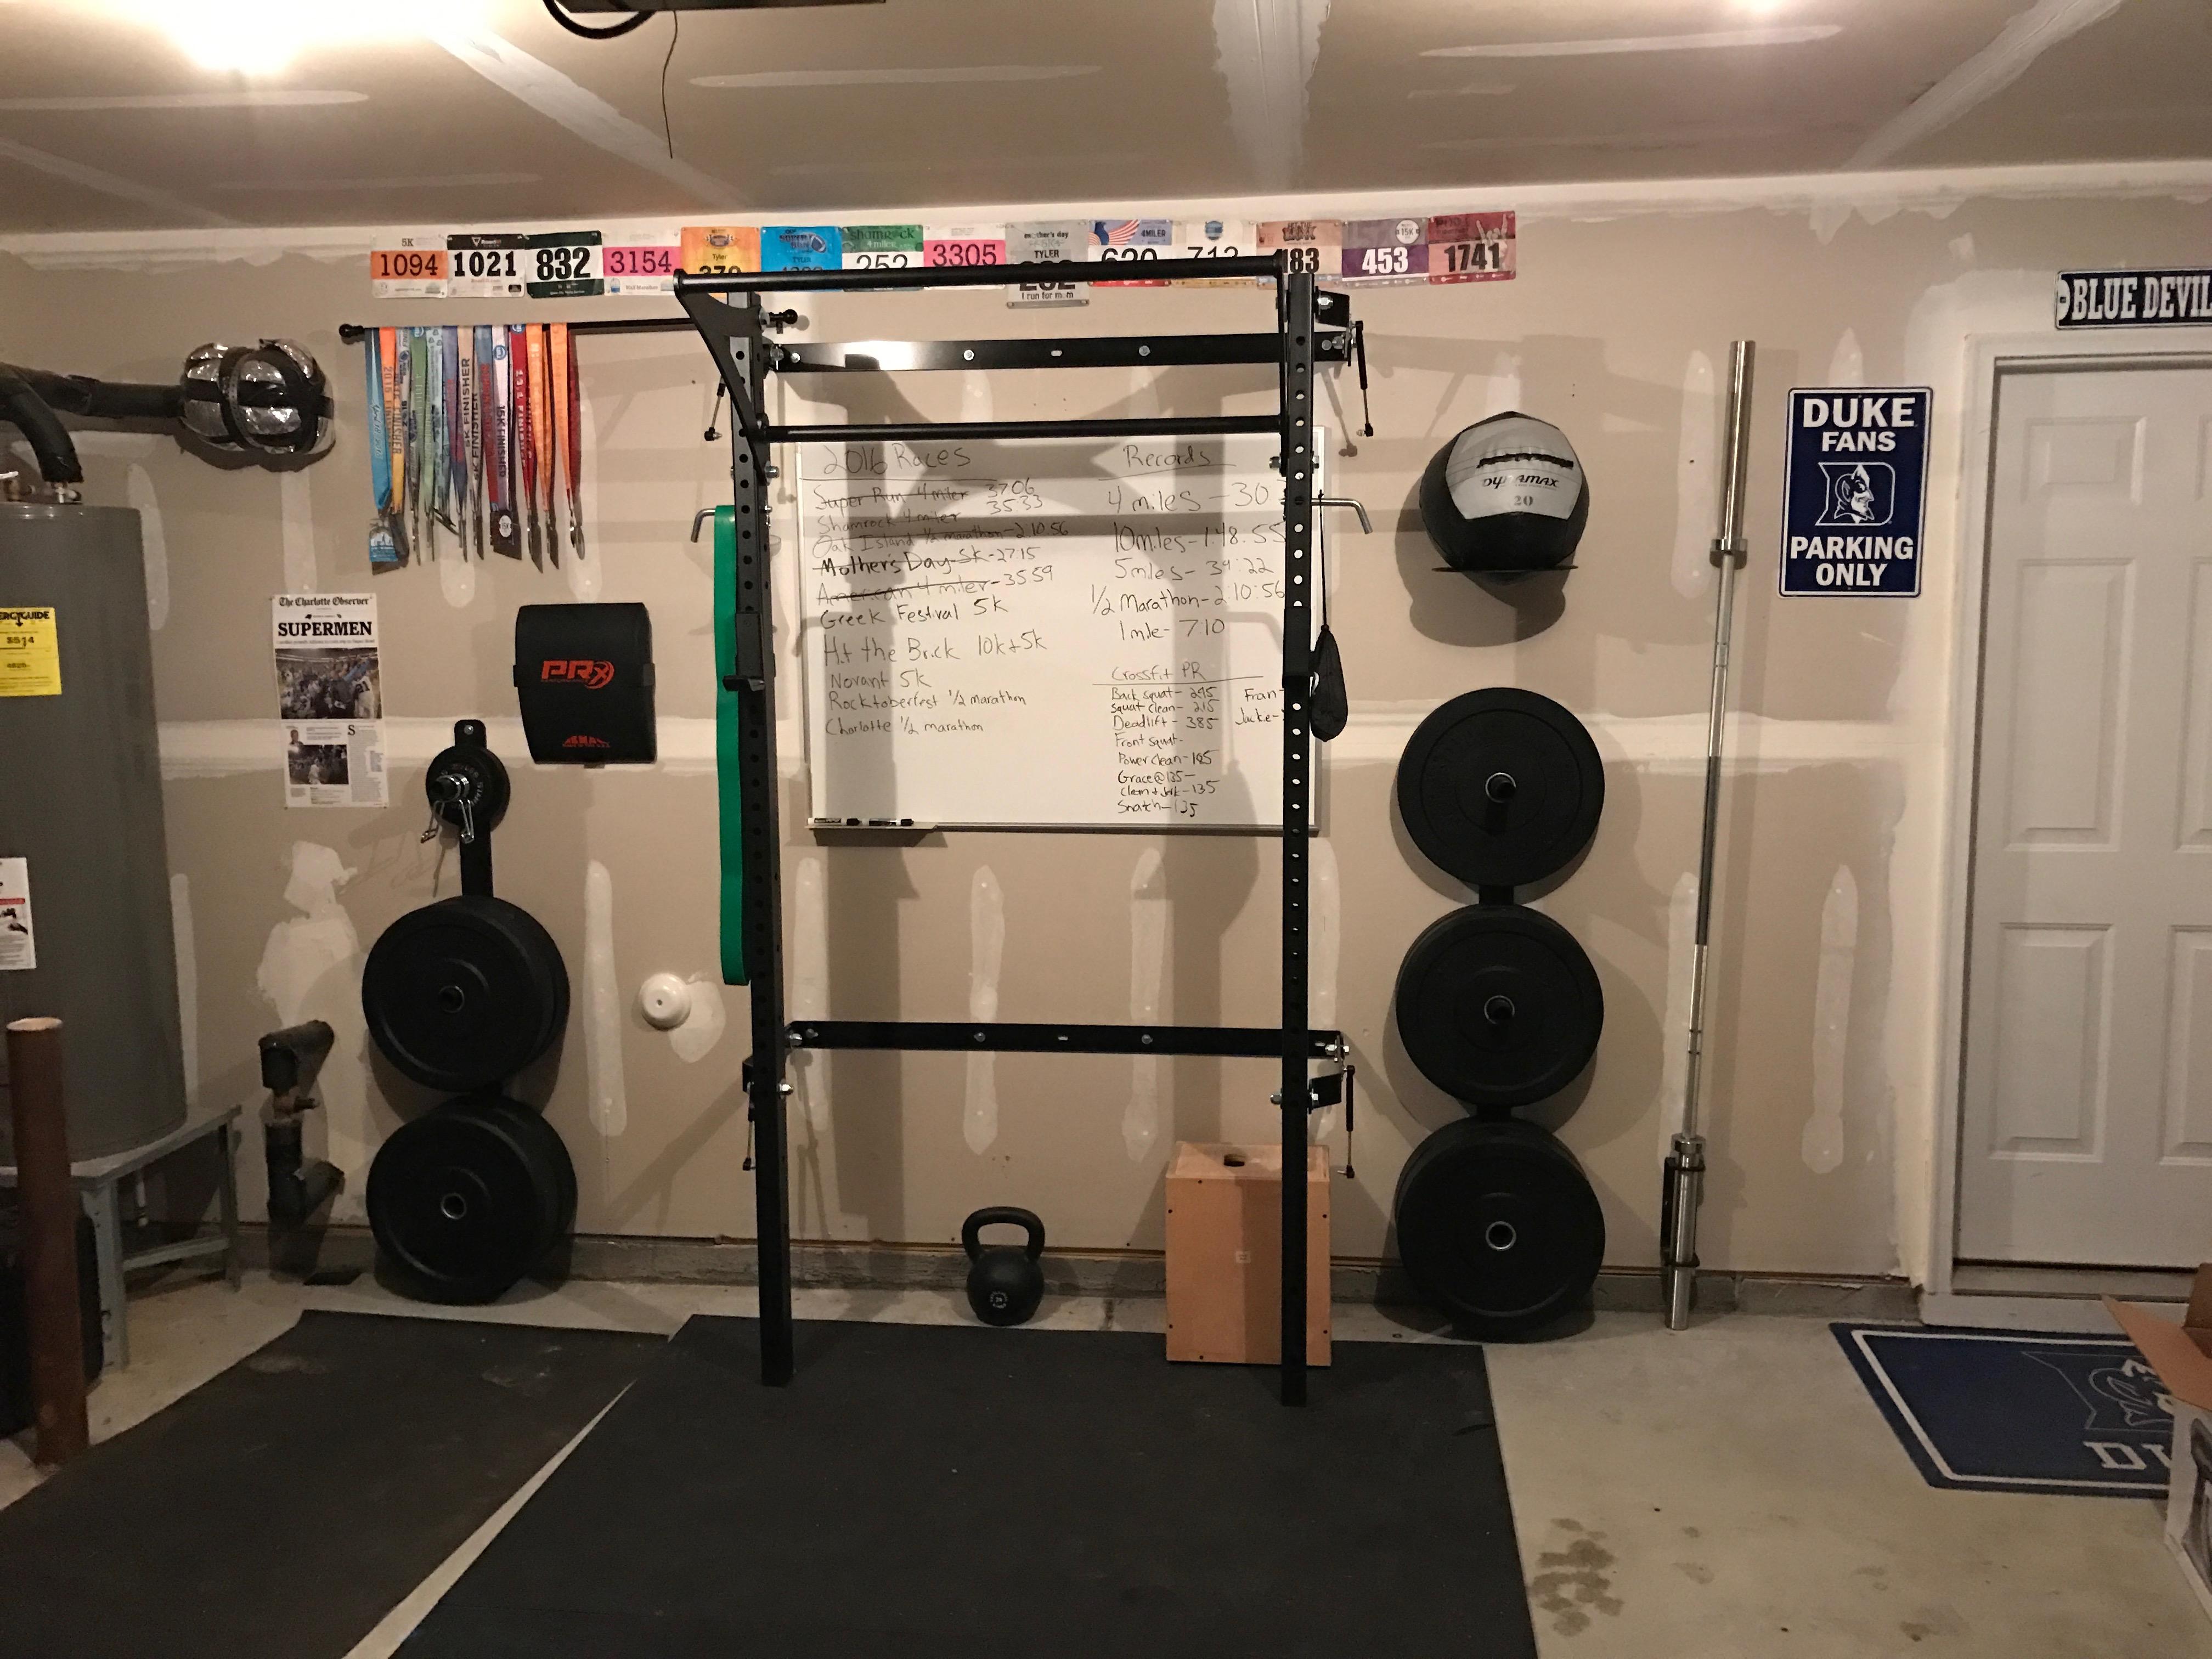 Diy affordable dry erase board crossfit garage garage gym